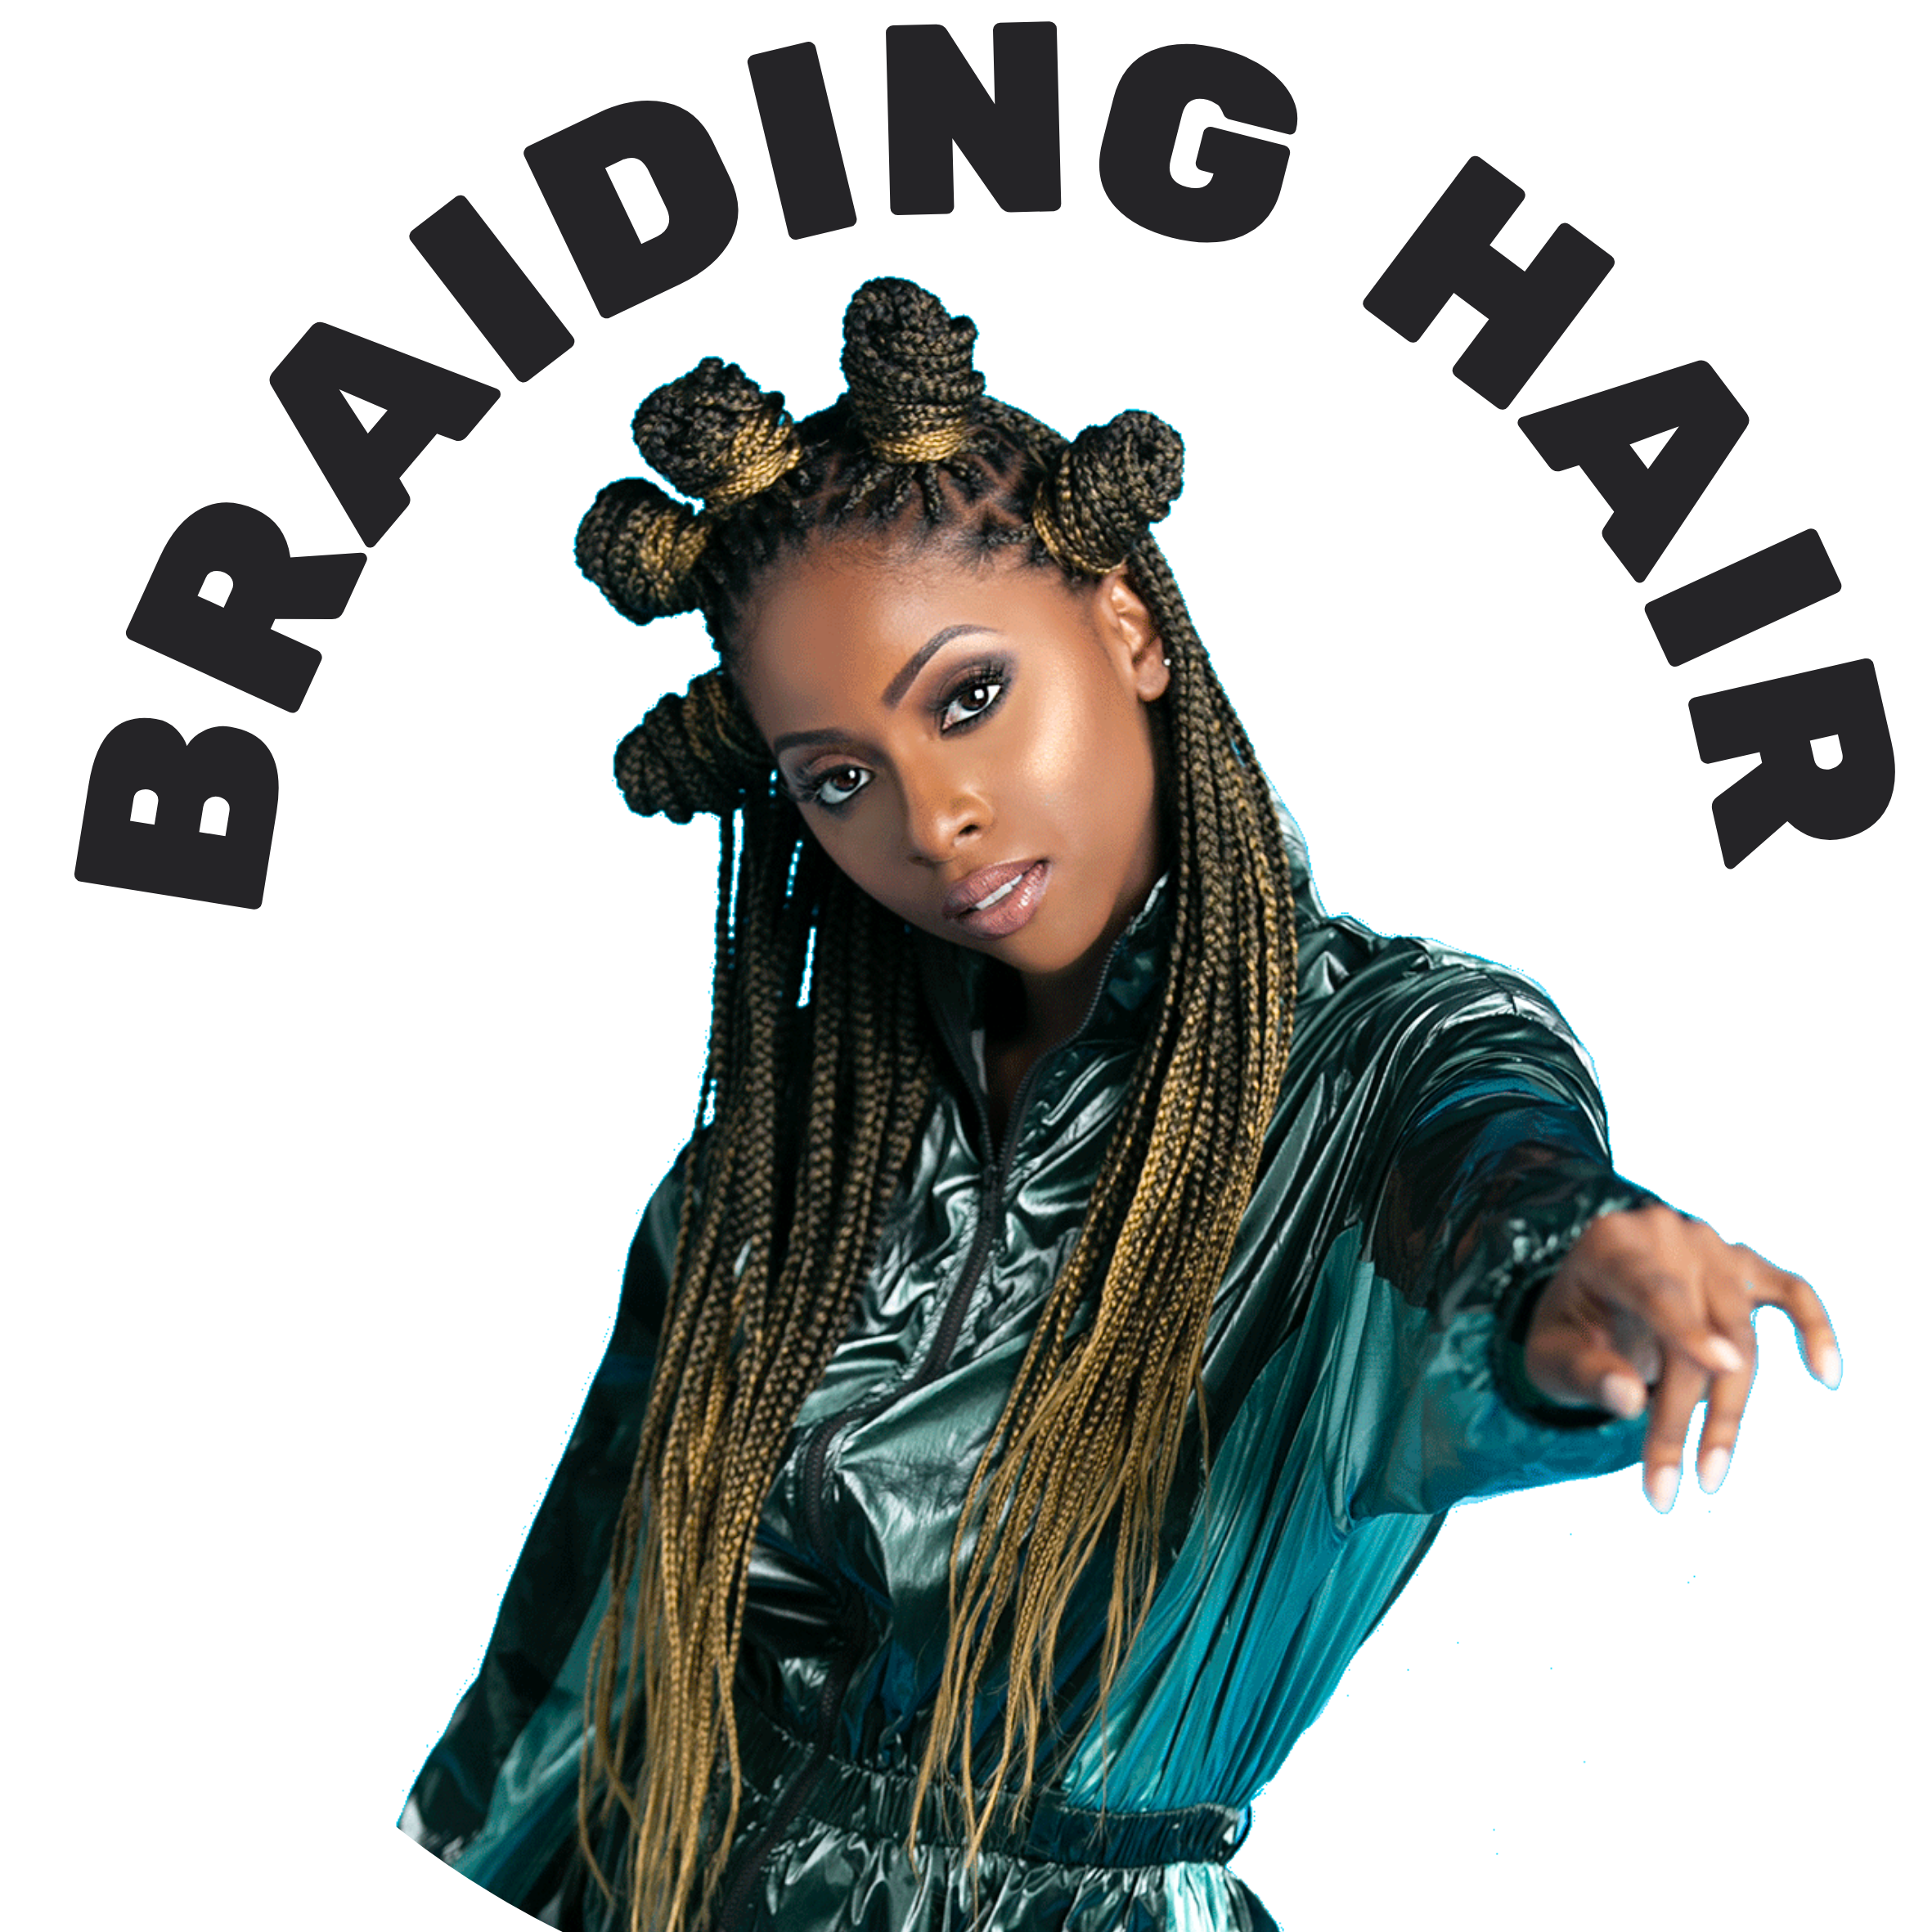 Braiding hair, marley hair, twiss, kinky hair, pretstretched hair for protective styles